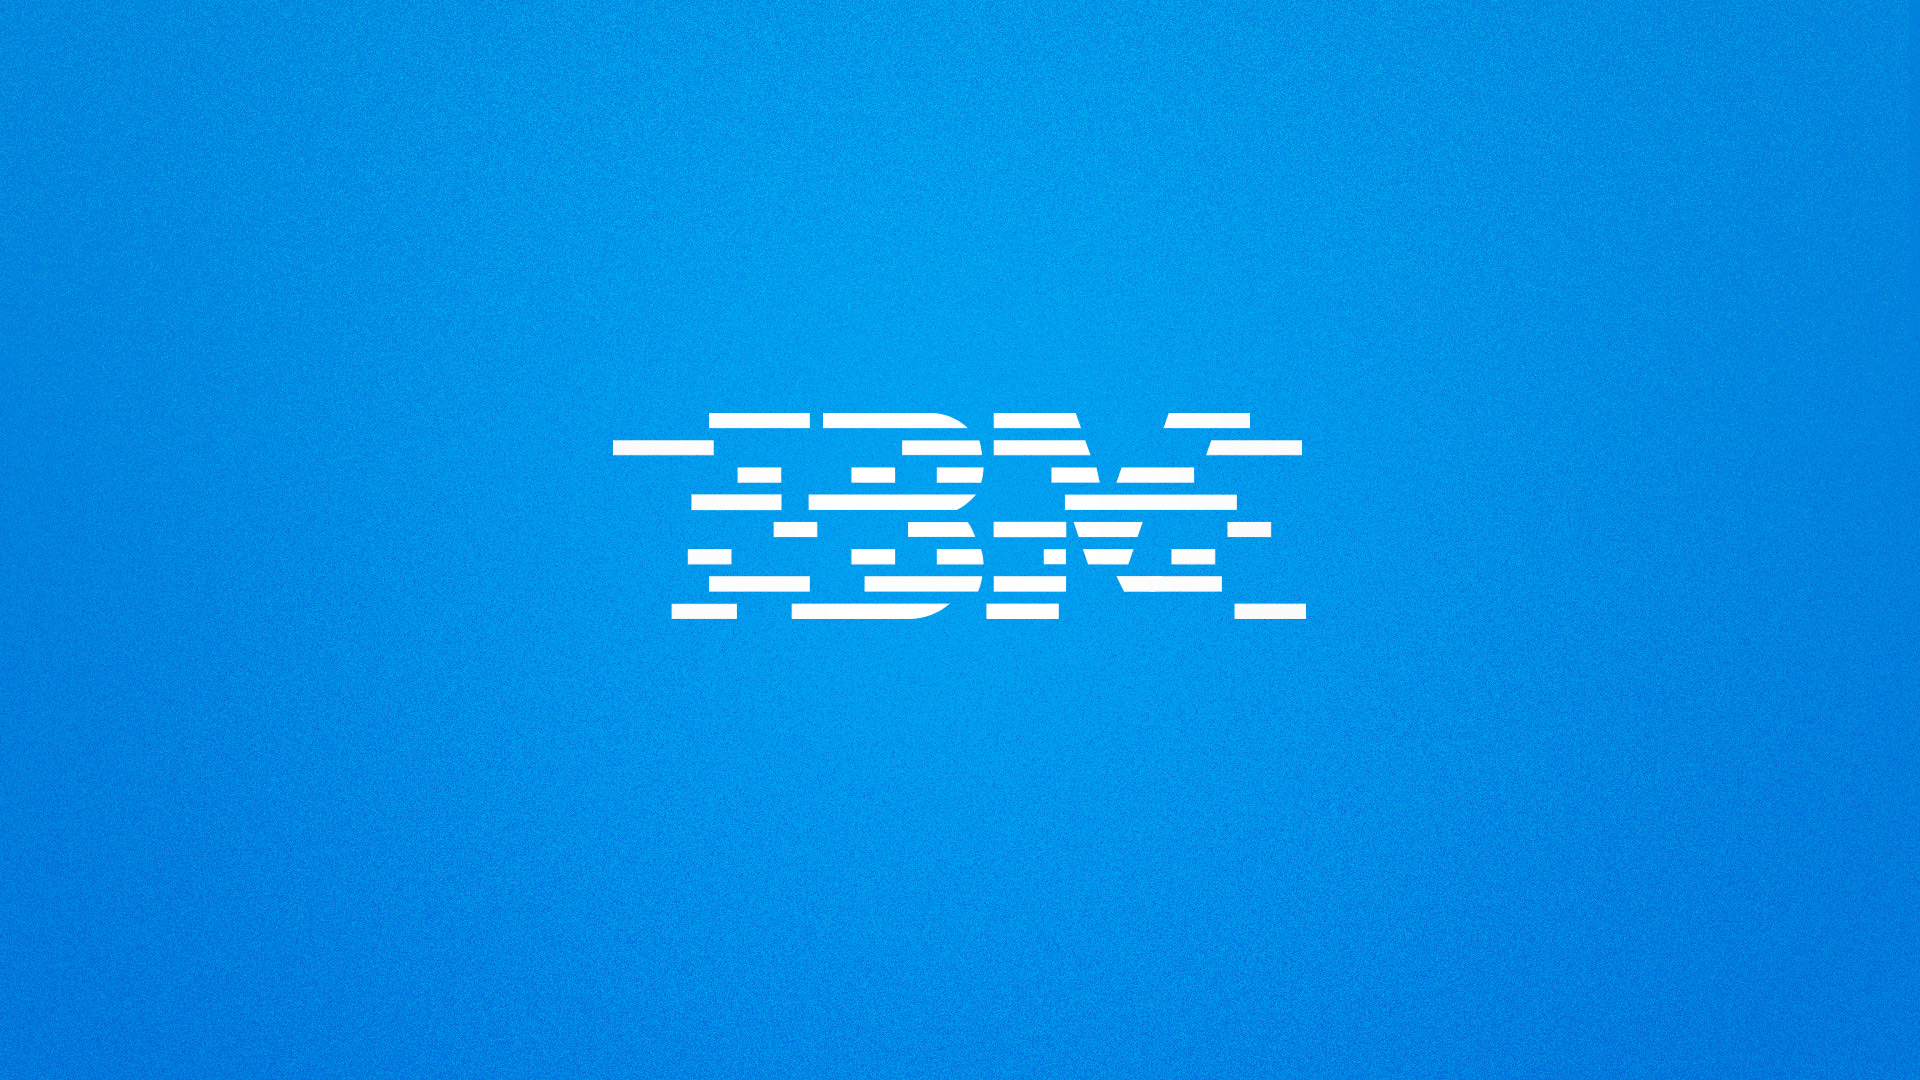 FRAME-20-IBM-JerryNelson